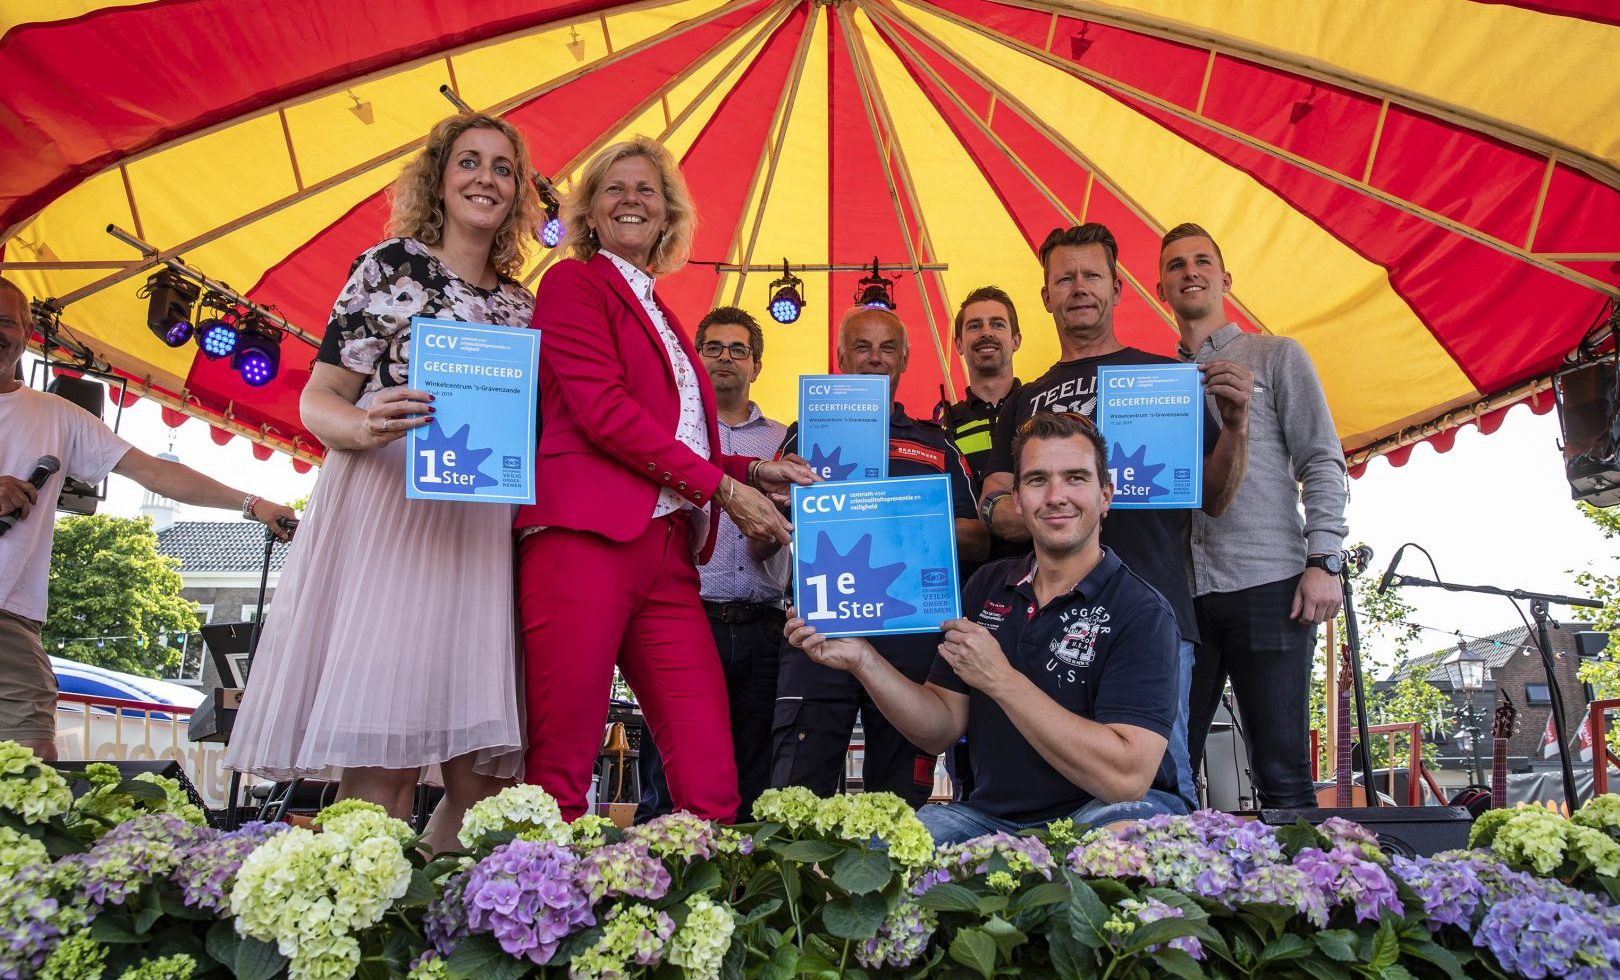 KVO: 1e ster behaald door samenwerking ondernemers, gemeente, politie, brandweer en MKB Westland